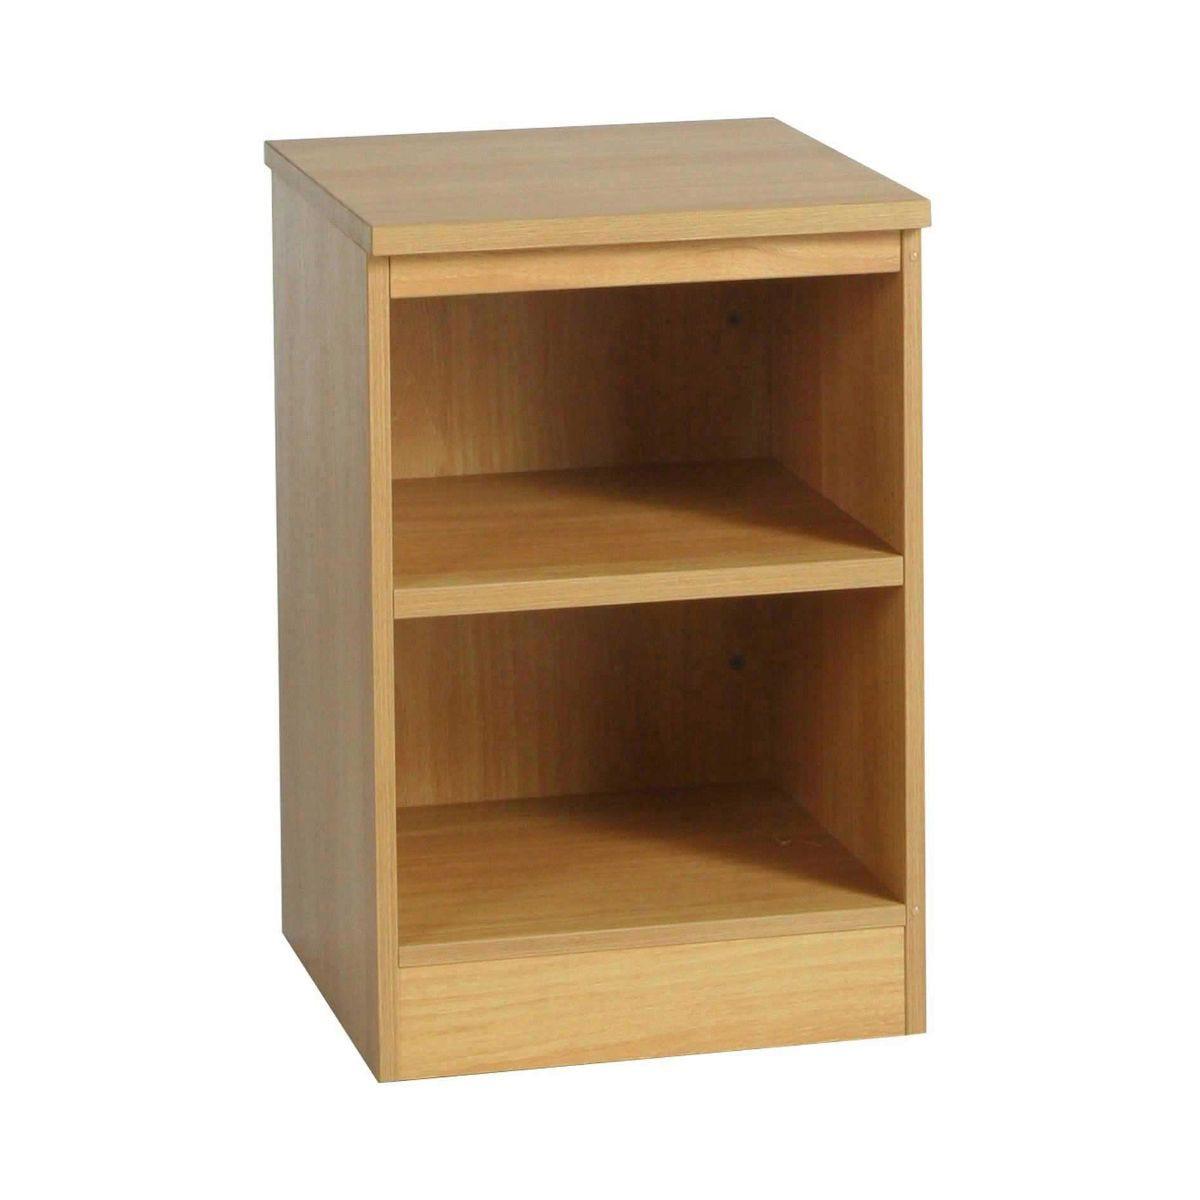 R White Single Bookcase B-B48 H728xW479xD540mm, Classic Oak